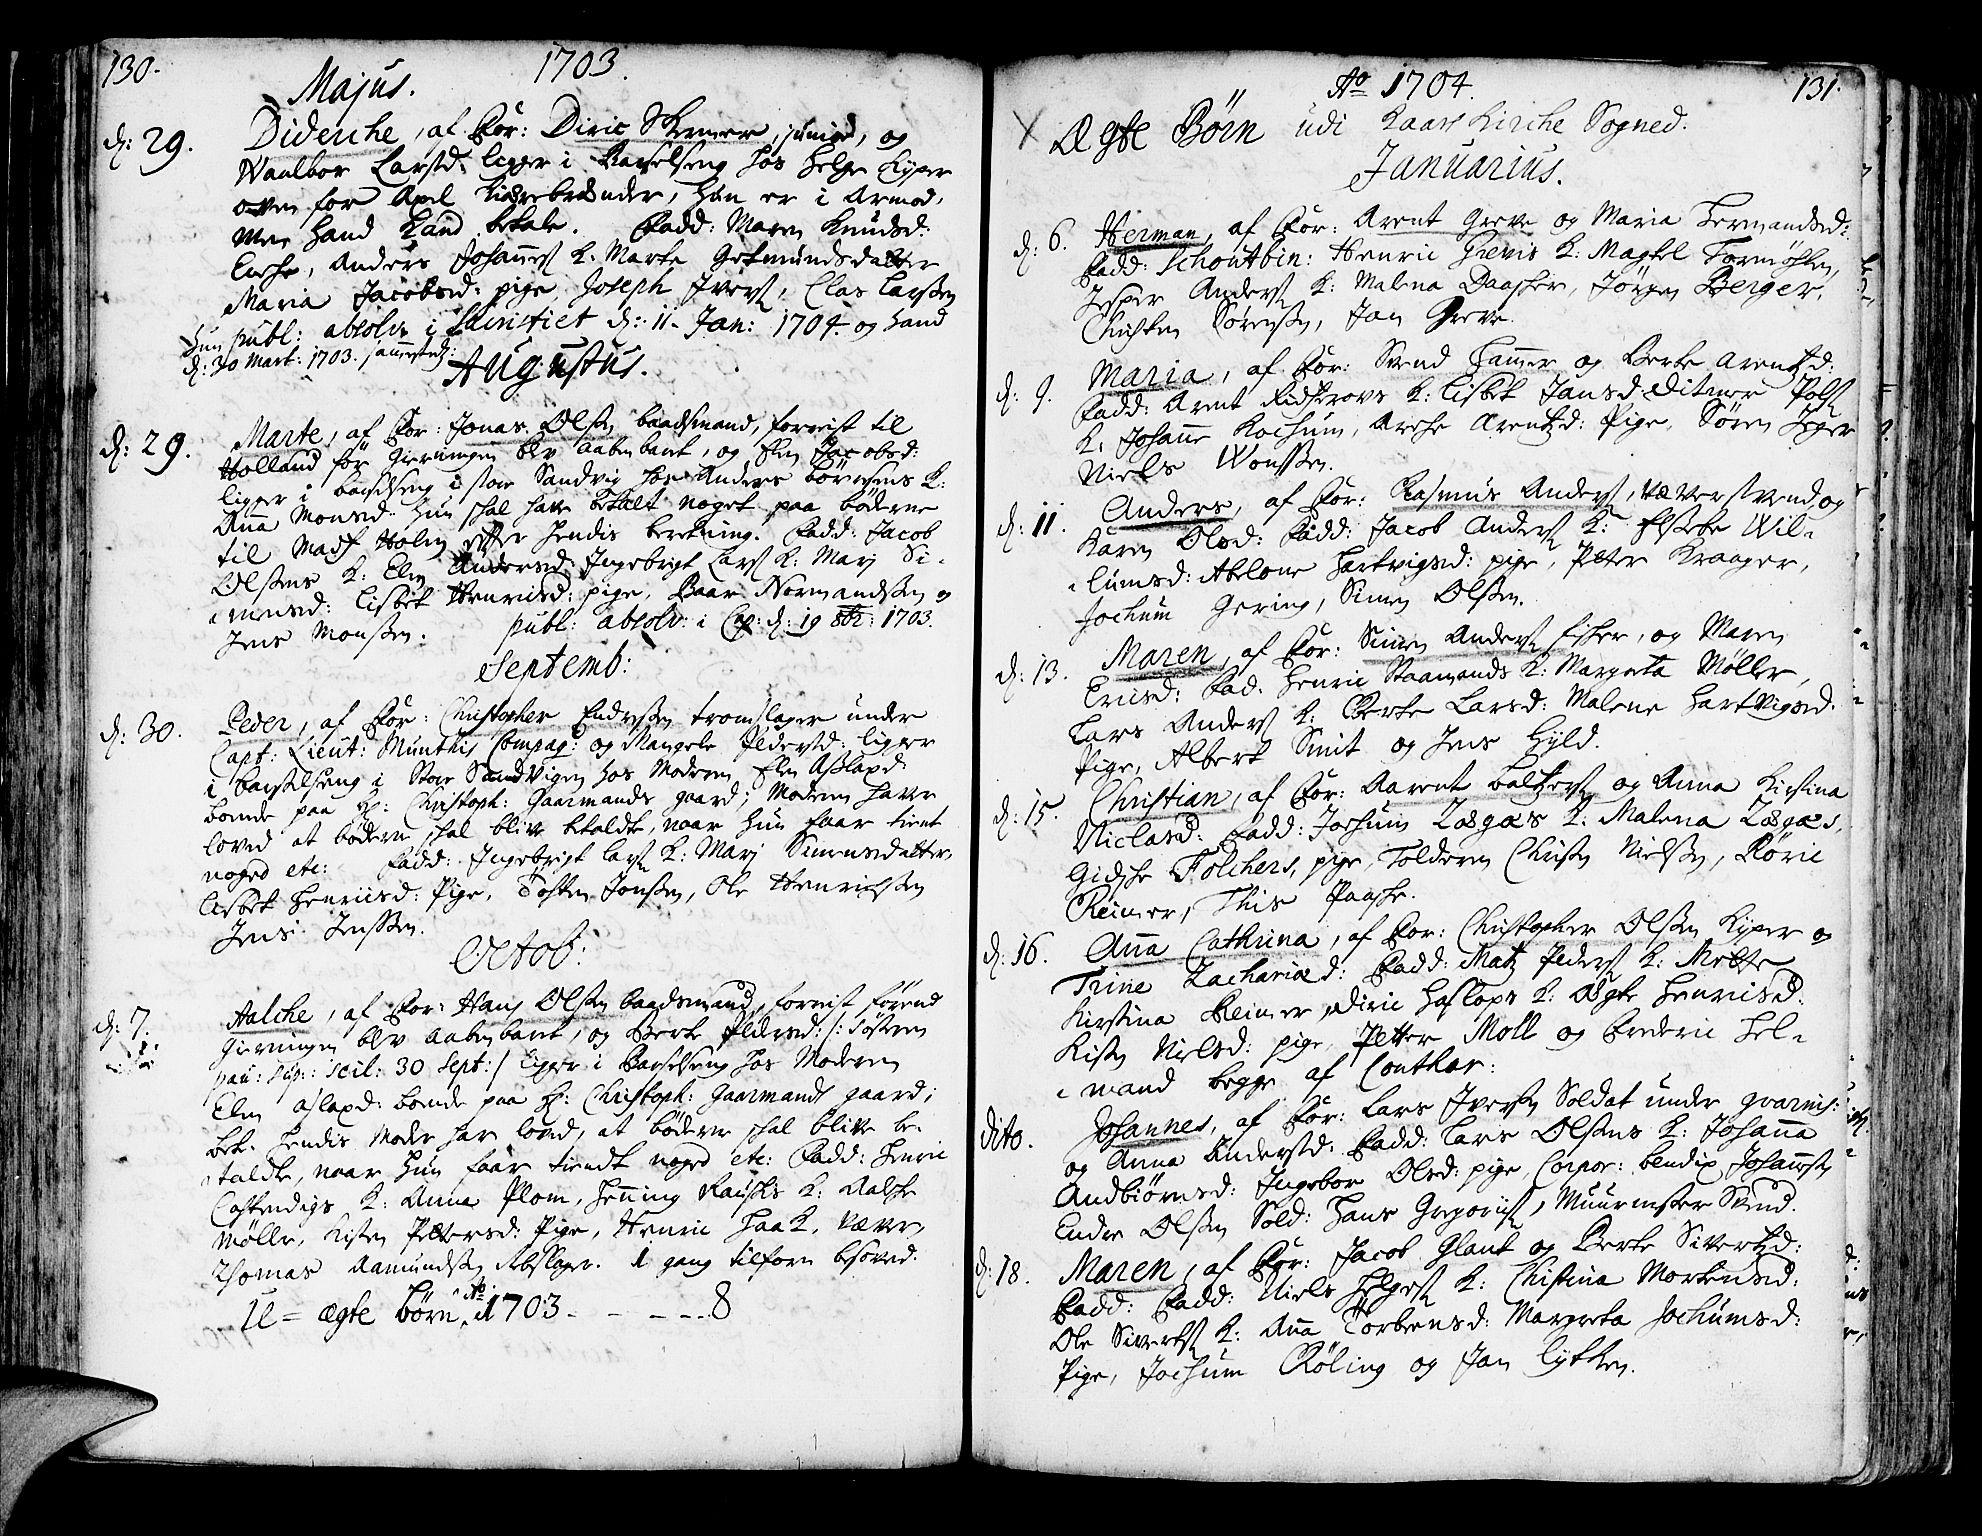 SAB, Korskirken Sokneprestembete, H/Haa/L0003: Ministerialbok nr. A 3, 1698-1719, s. 130-131